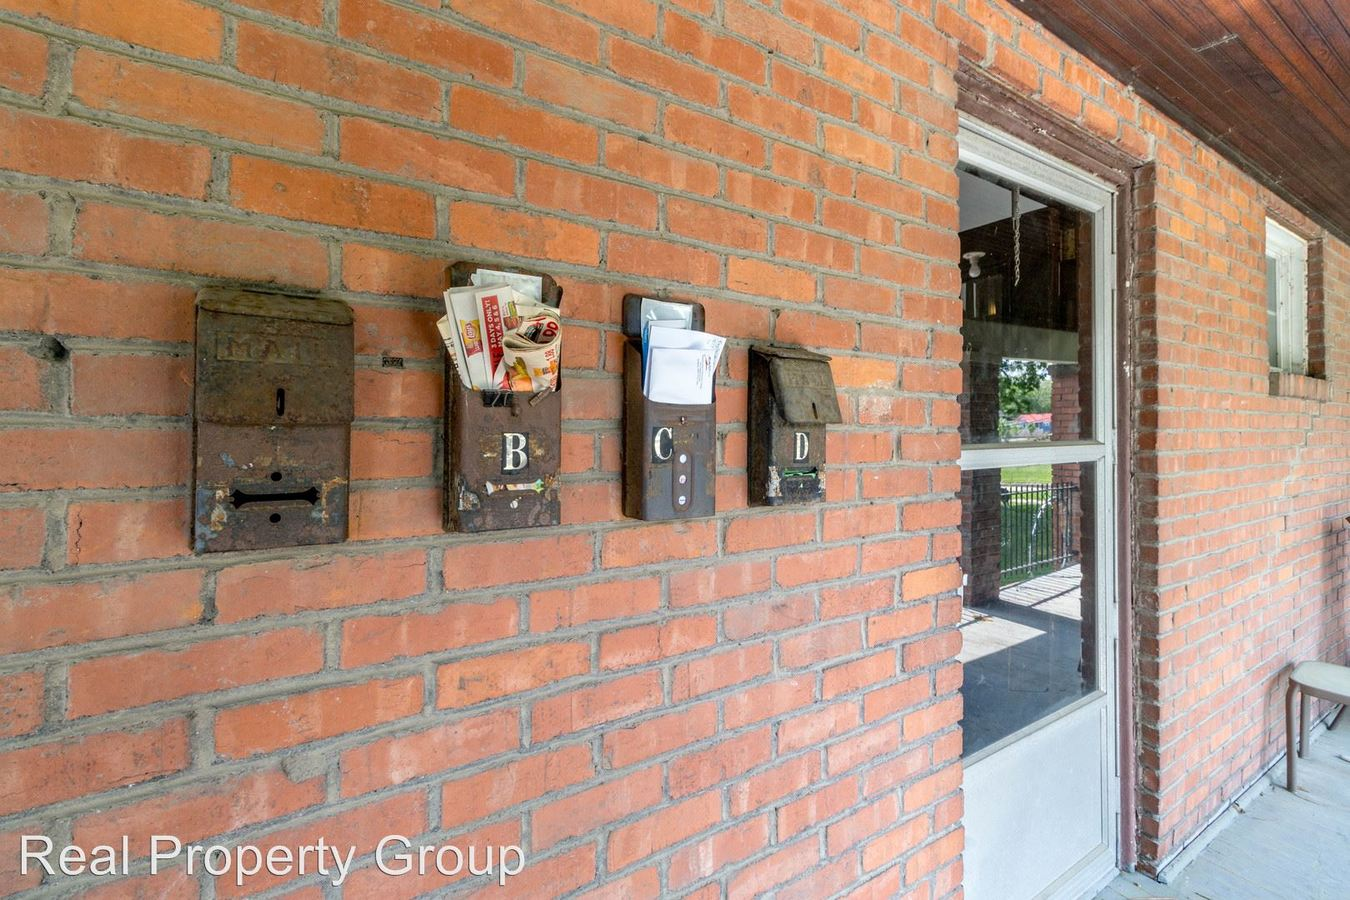 1 Bedroom 1 Bathroom Apartment for rent at 1317 Paris Road in Columbia, MO